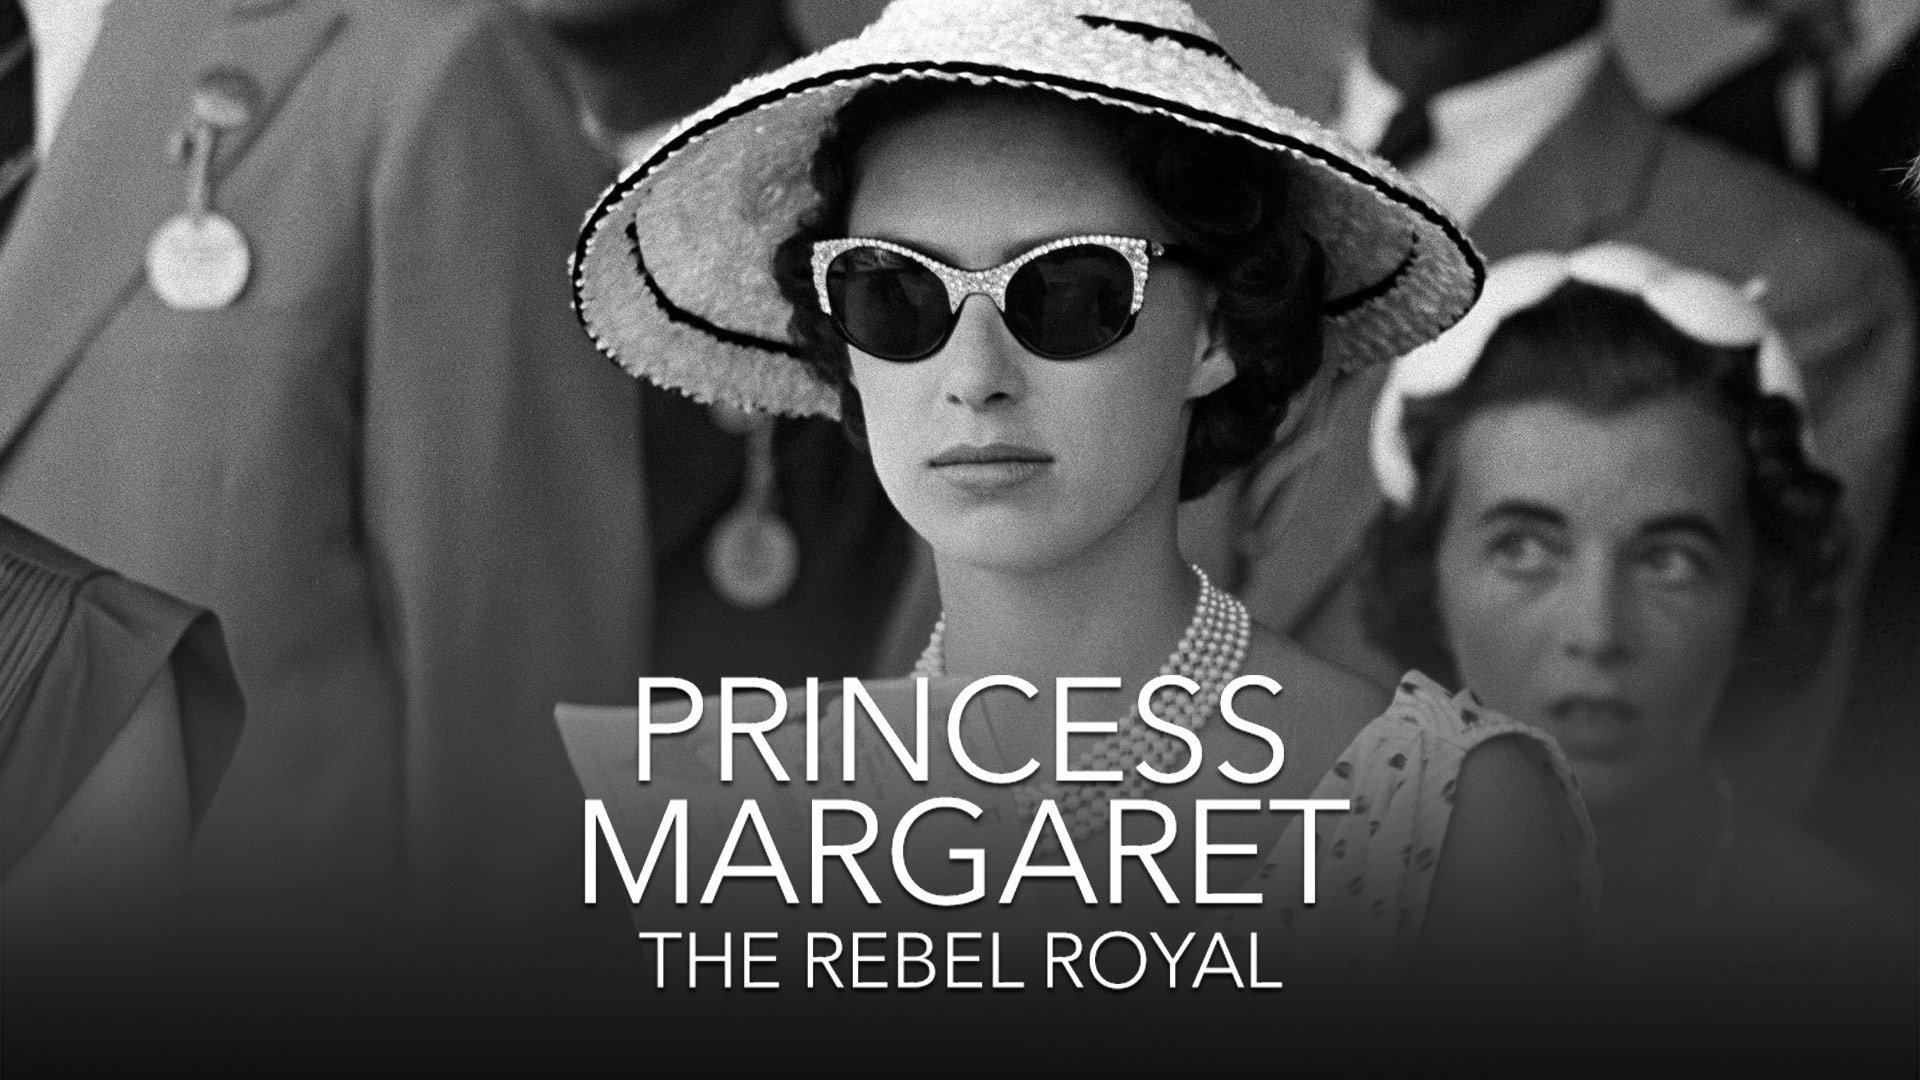 Princess Margaret: The Rebel Royal on BritBox UK